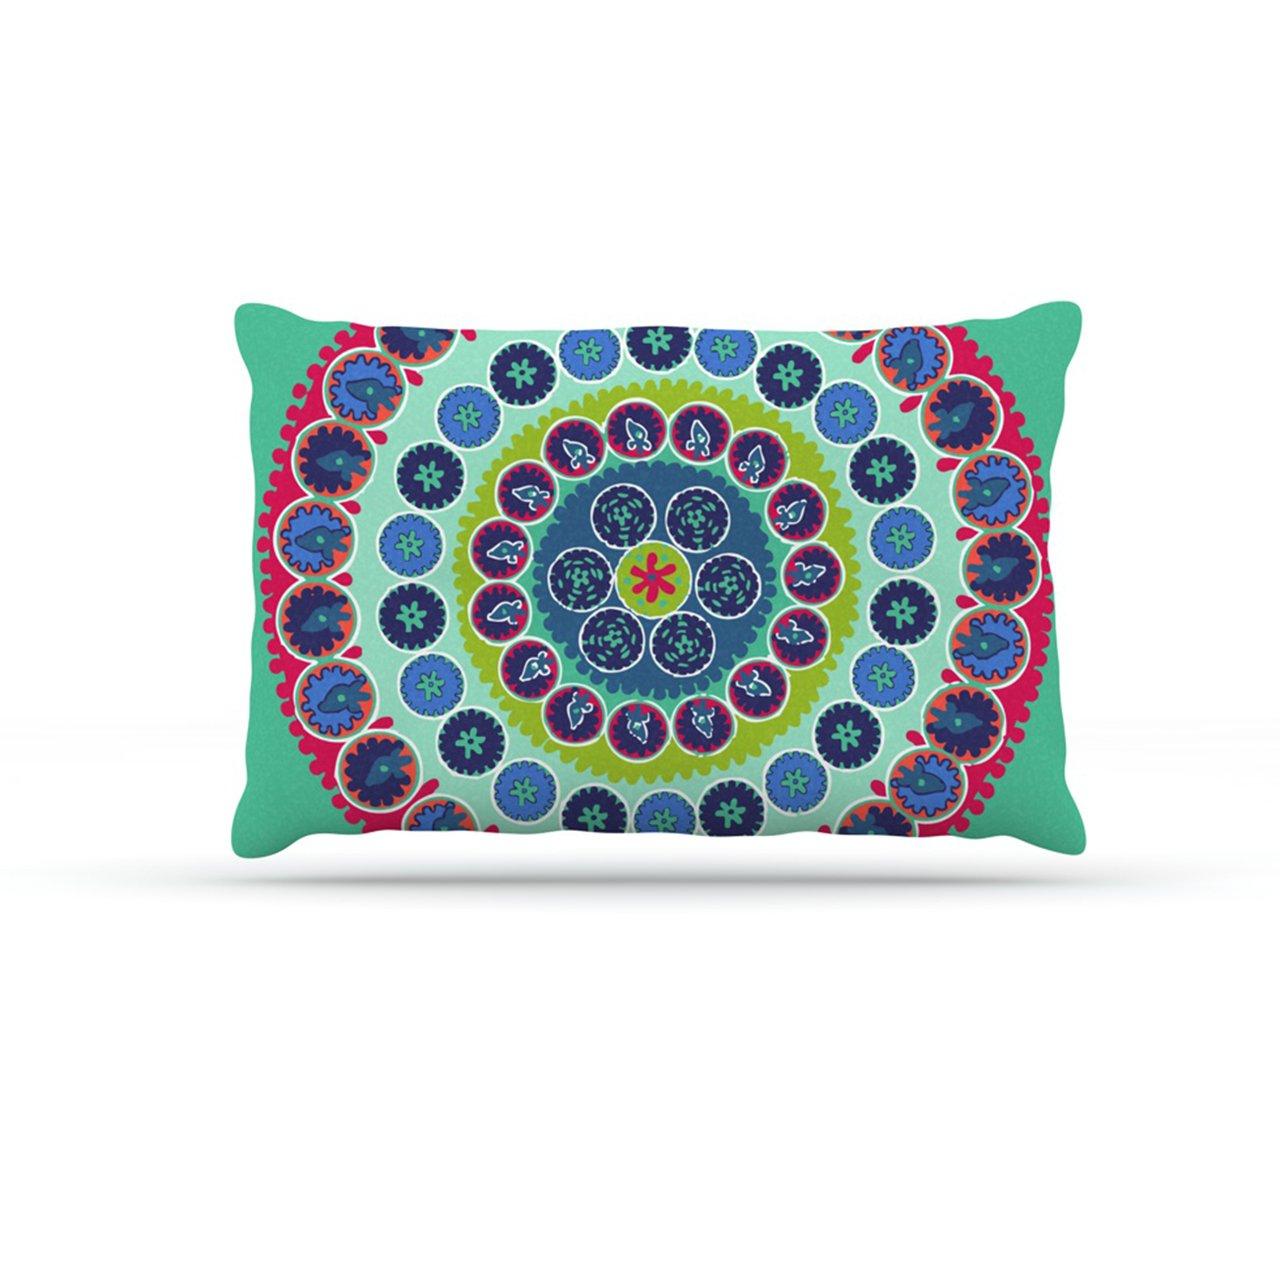 Kess InHouse Laura Nicholson Surkhandarya  Fleece Dog Bed, 50 by 60 , Multicolor